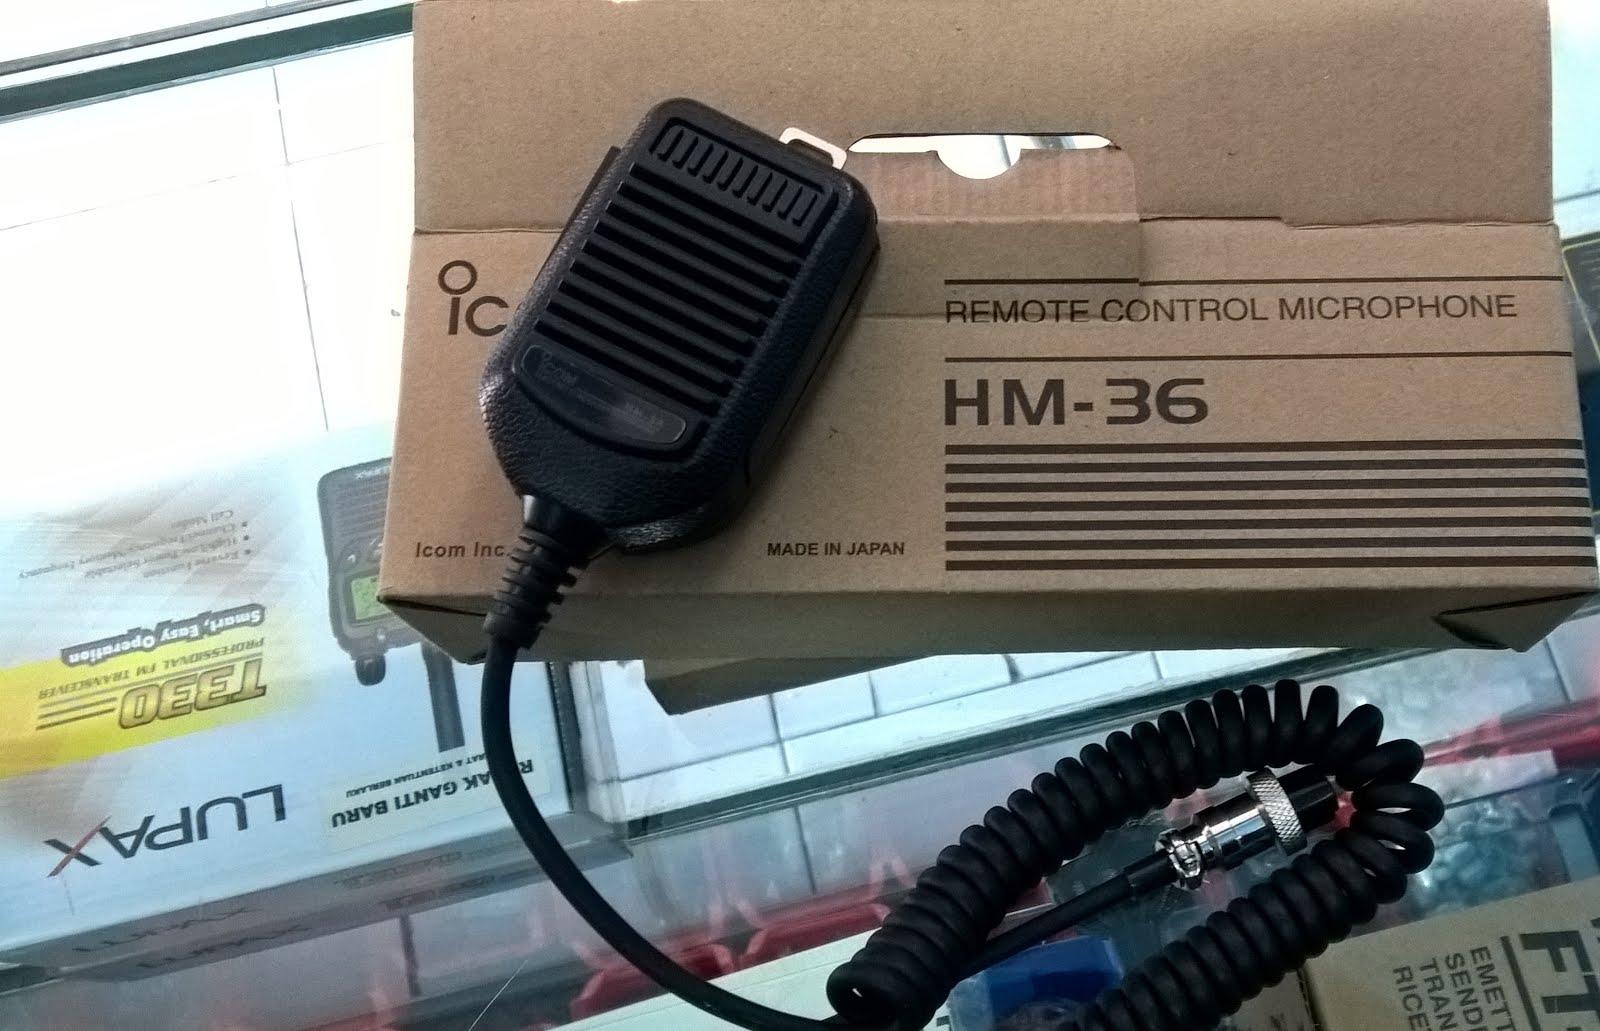 HANDMIC ICOM HM-36